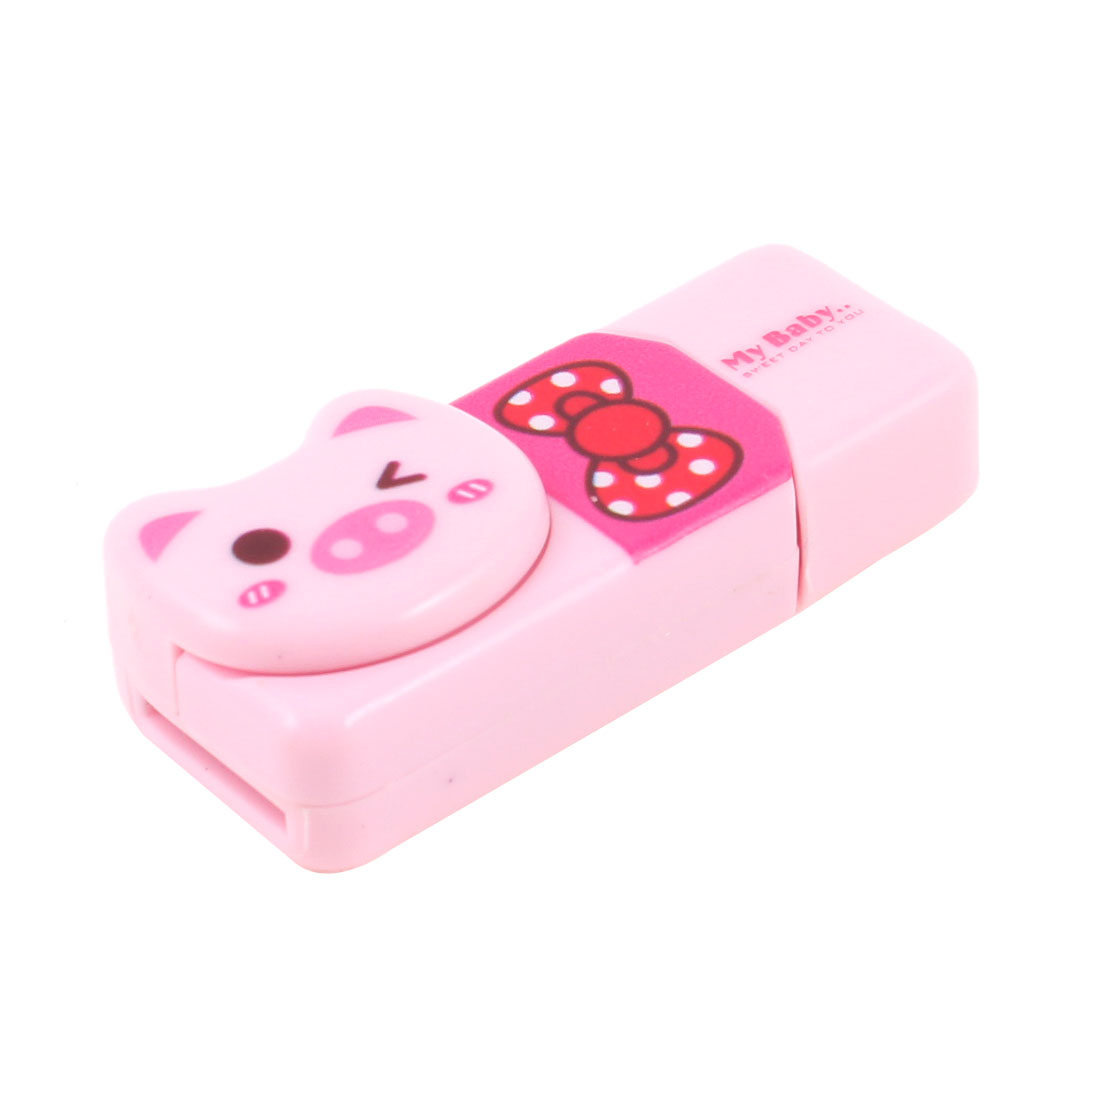 Fuchsia Bowknot Print Plastic Shell USB SD TF Memory Card Reader